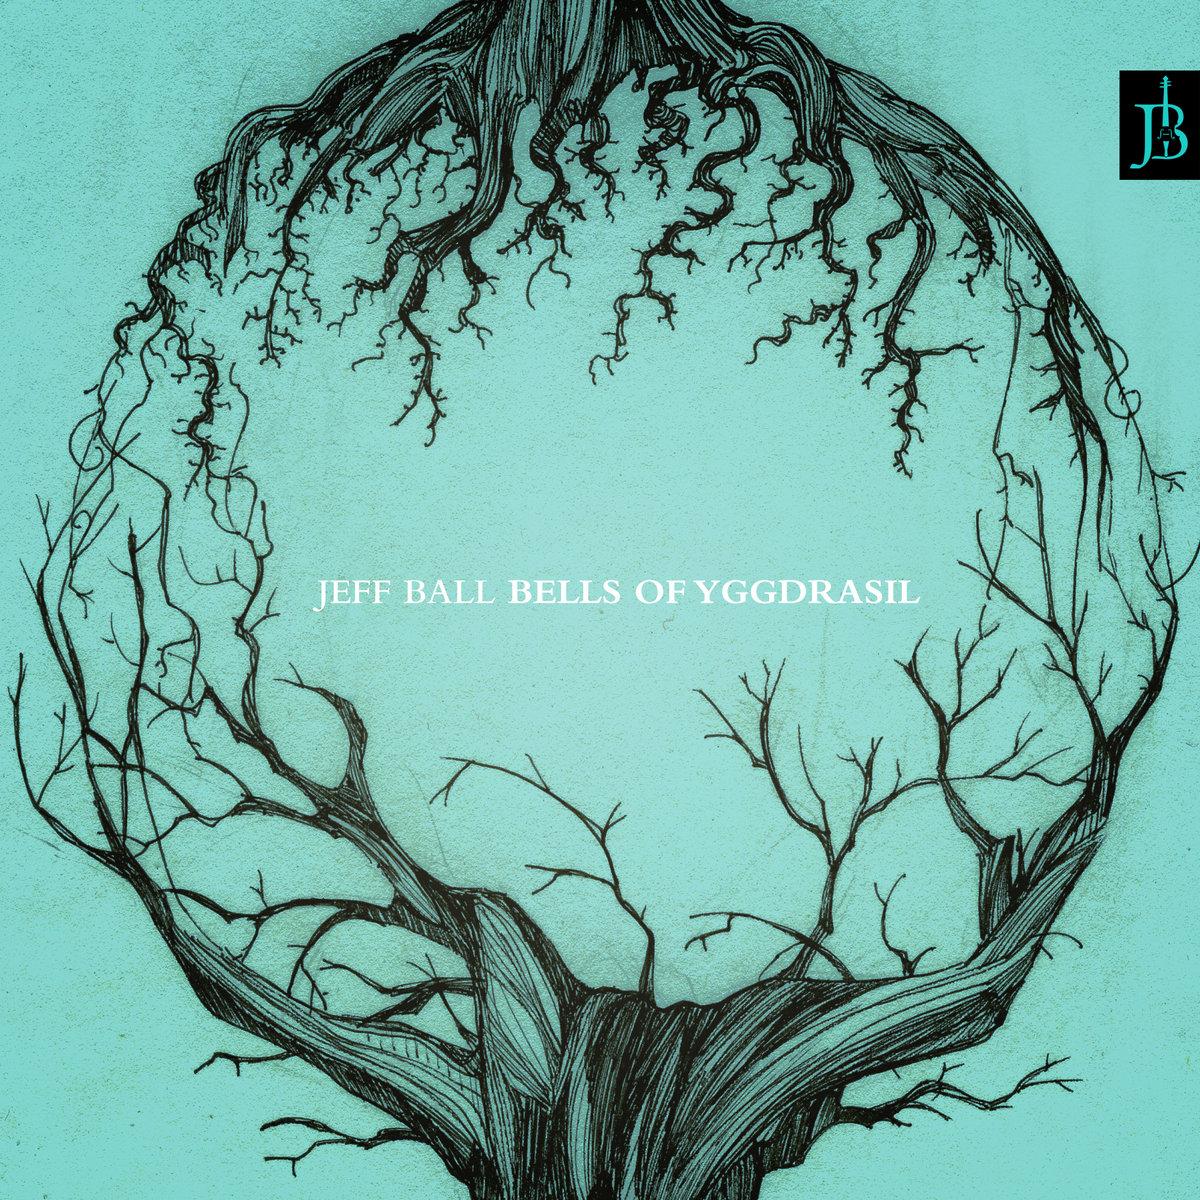 Bells of yggdrasil jeff ball